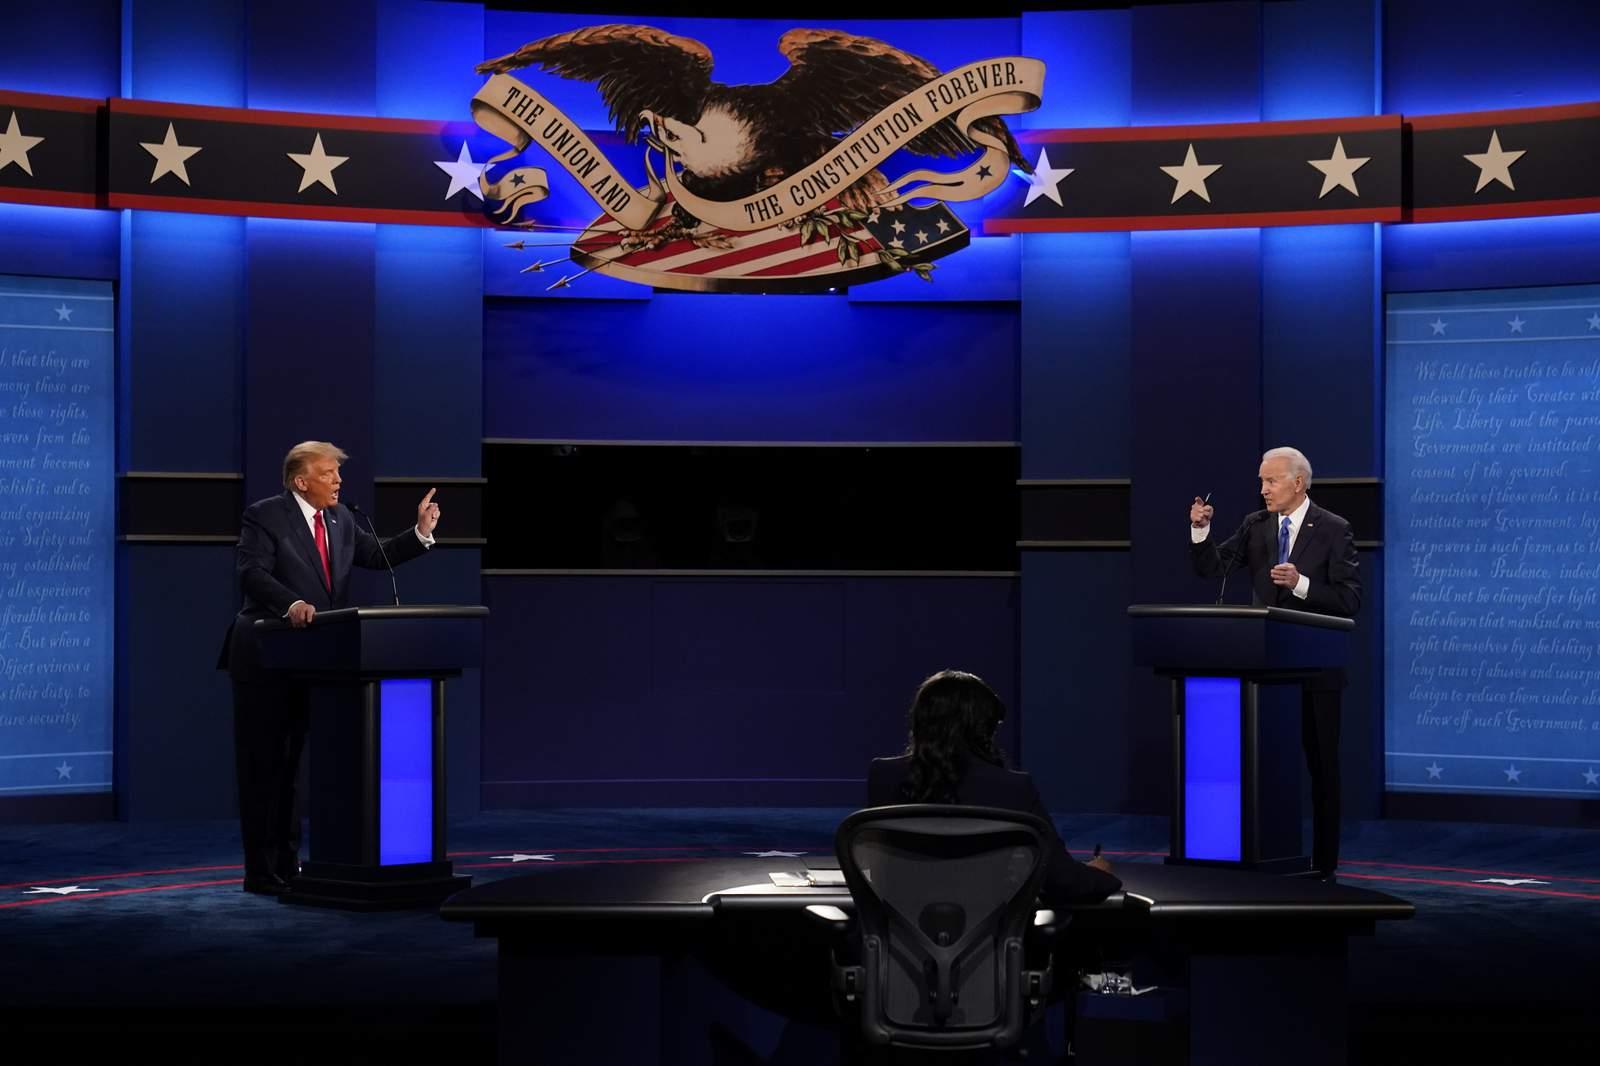 Election usa live president 2020 U.S. election